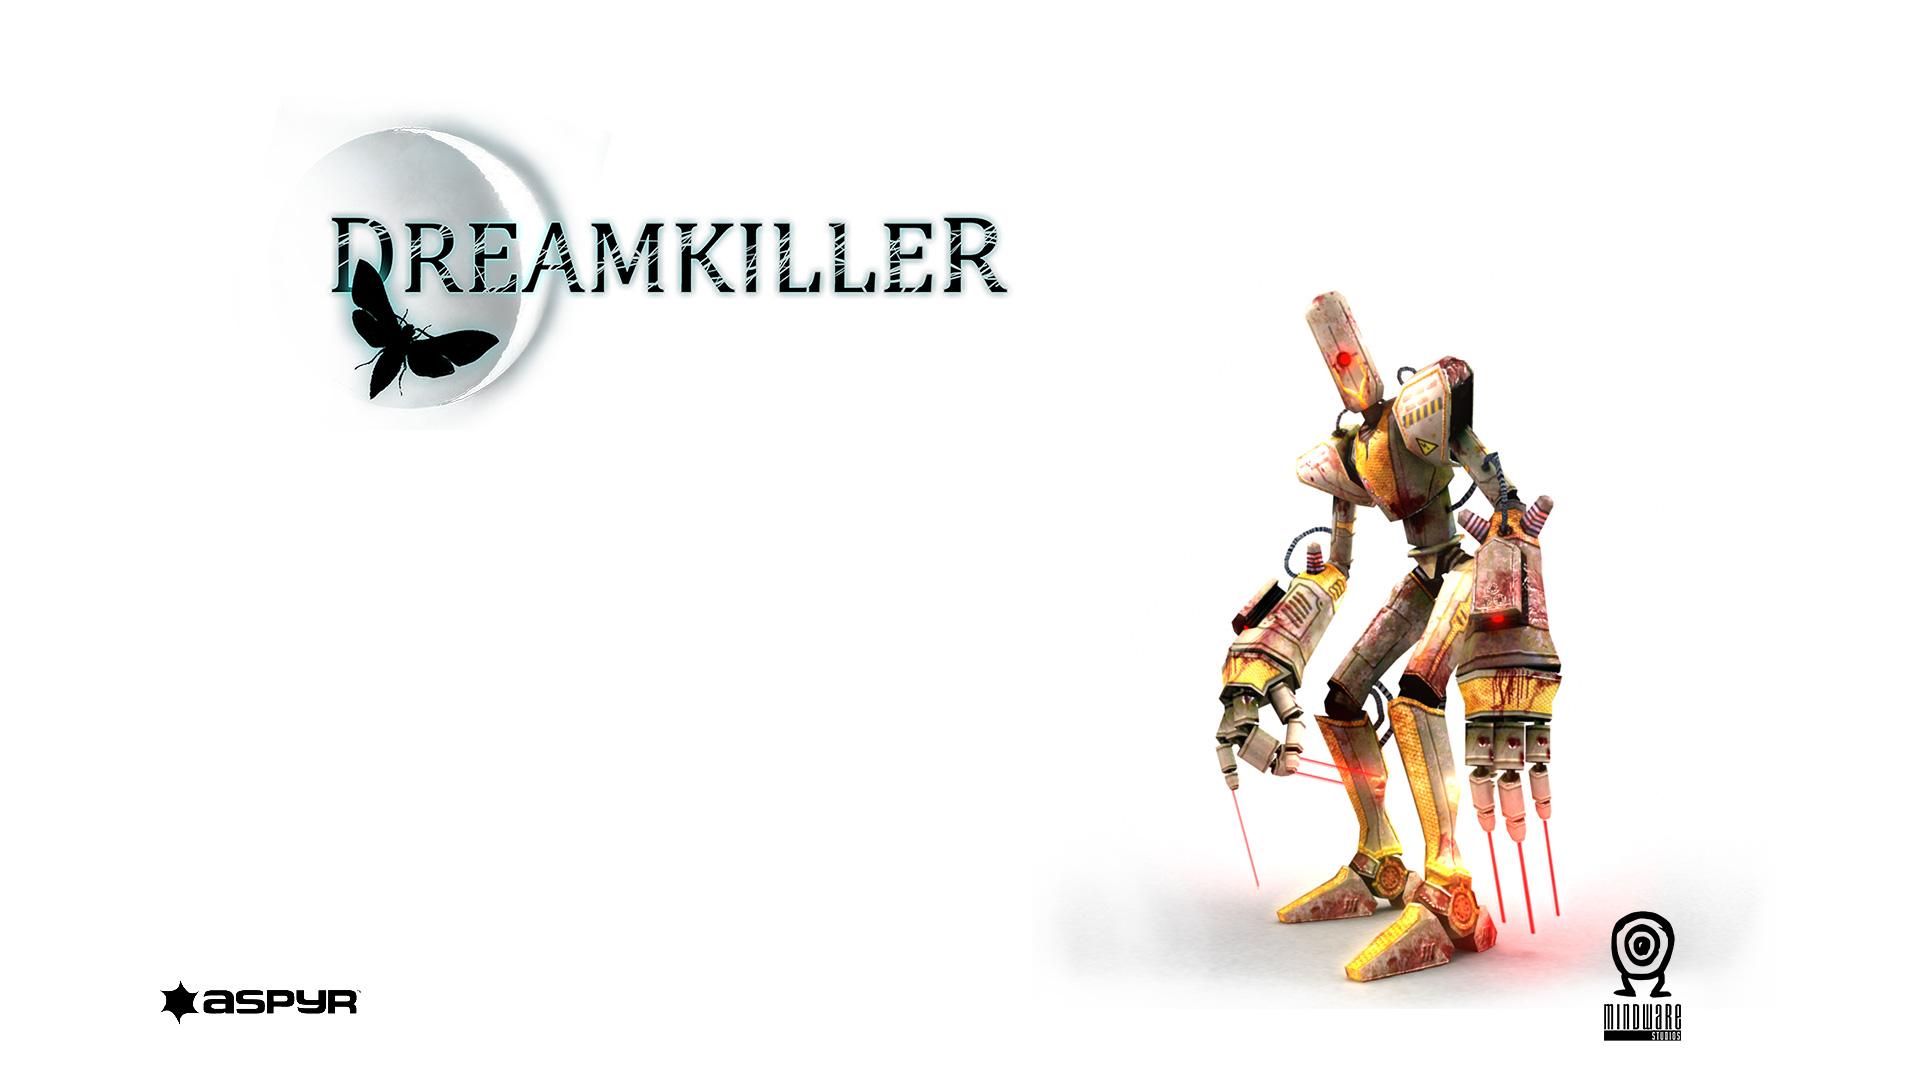 Free Dreamkiller Wallpaper in 1920x1080